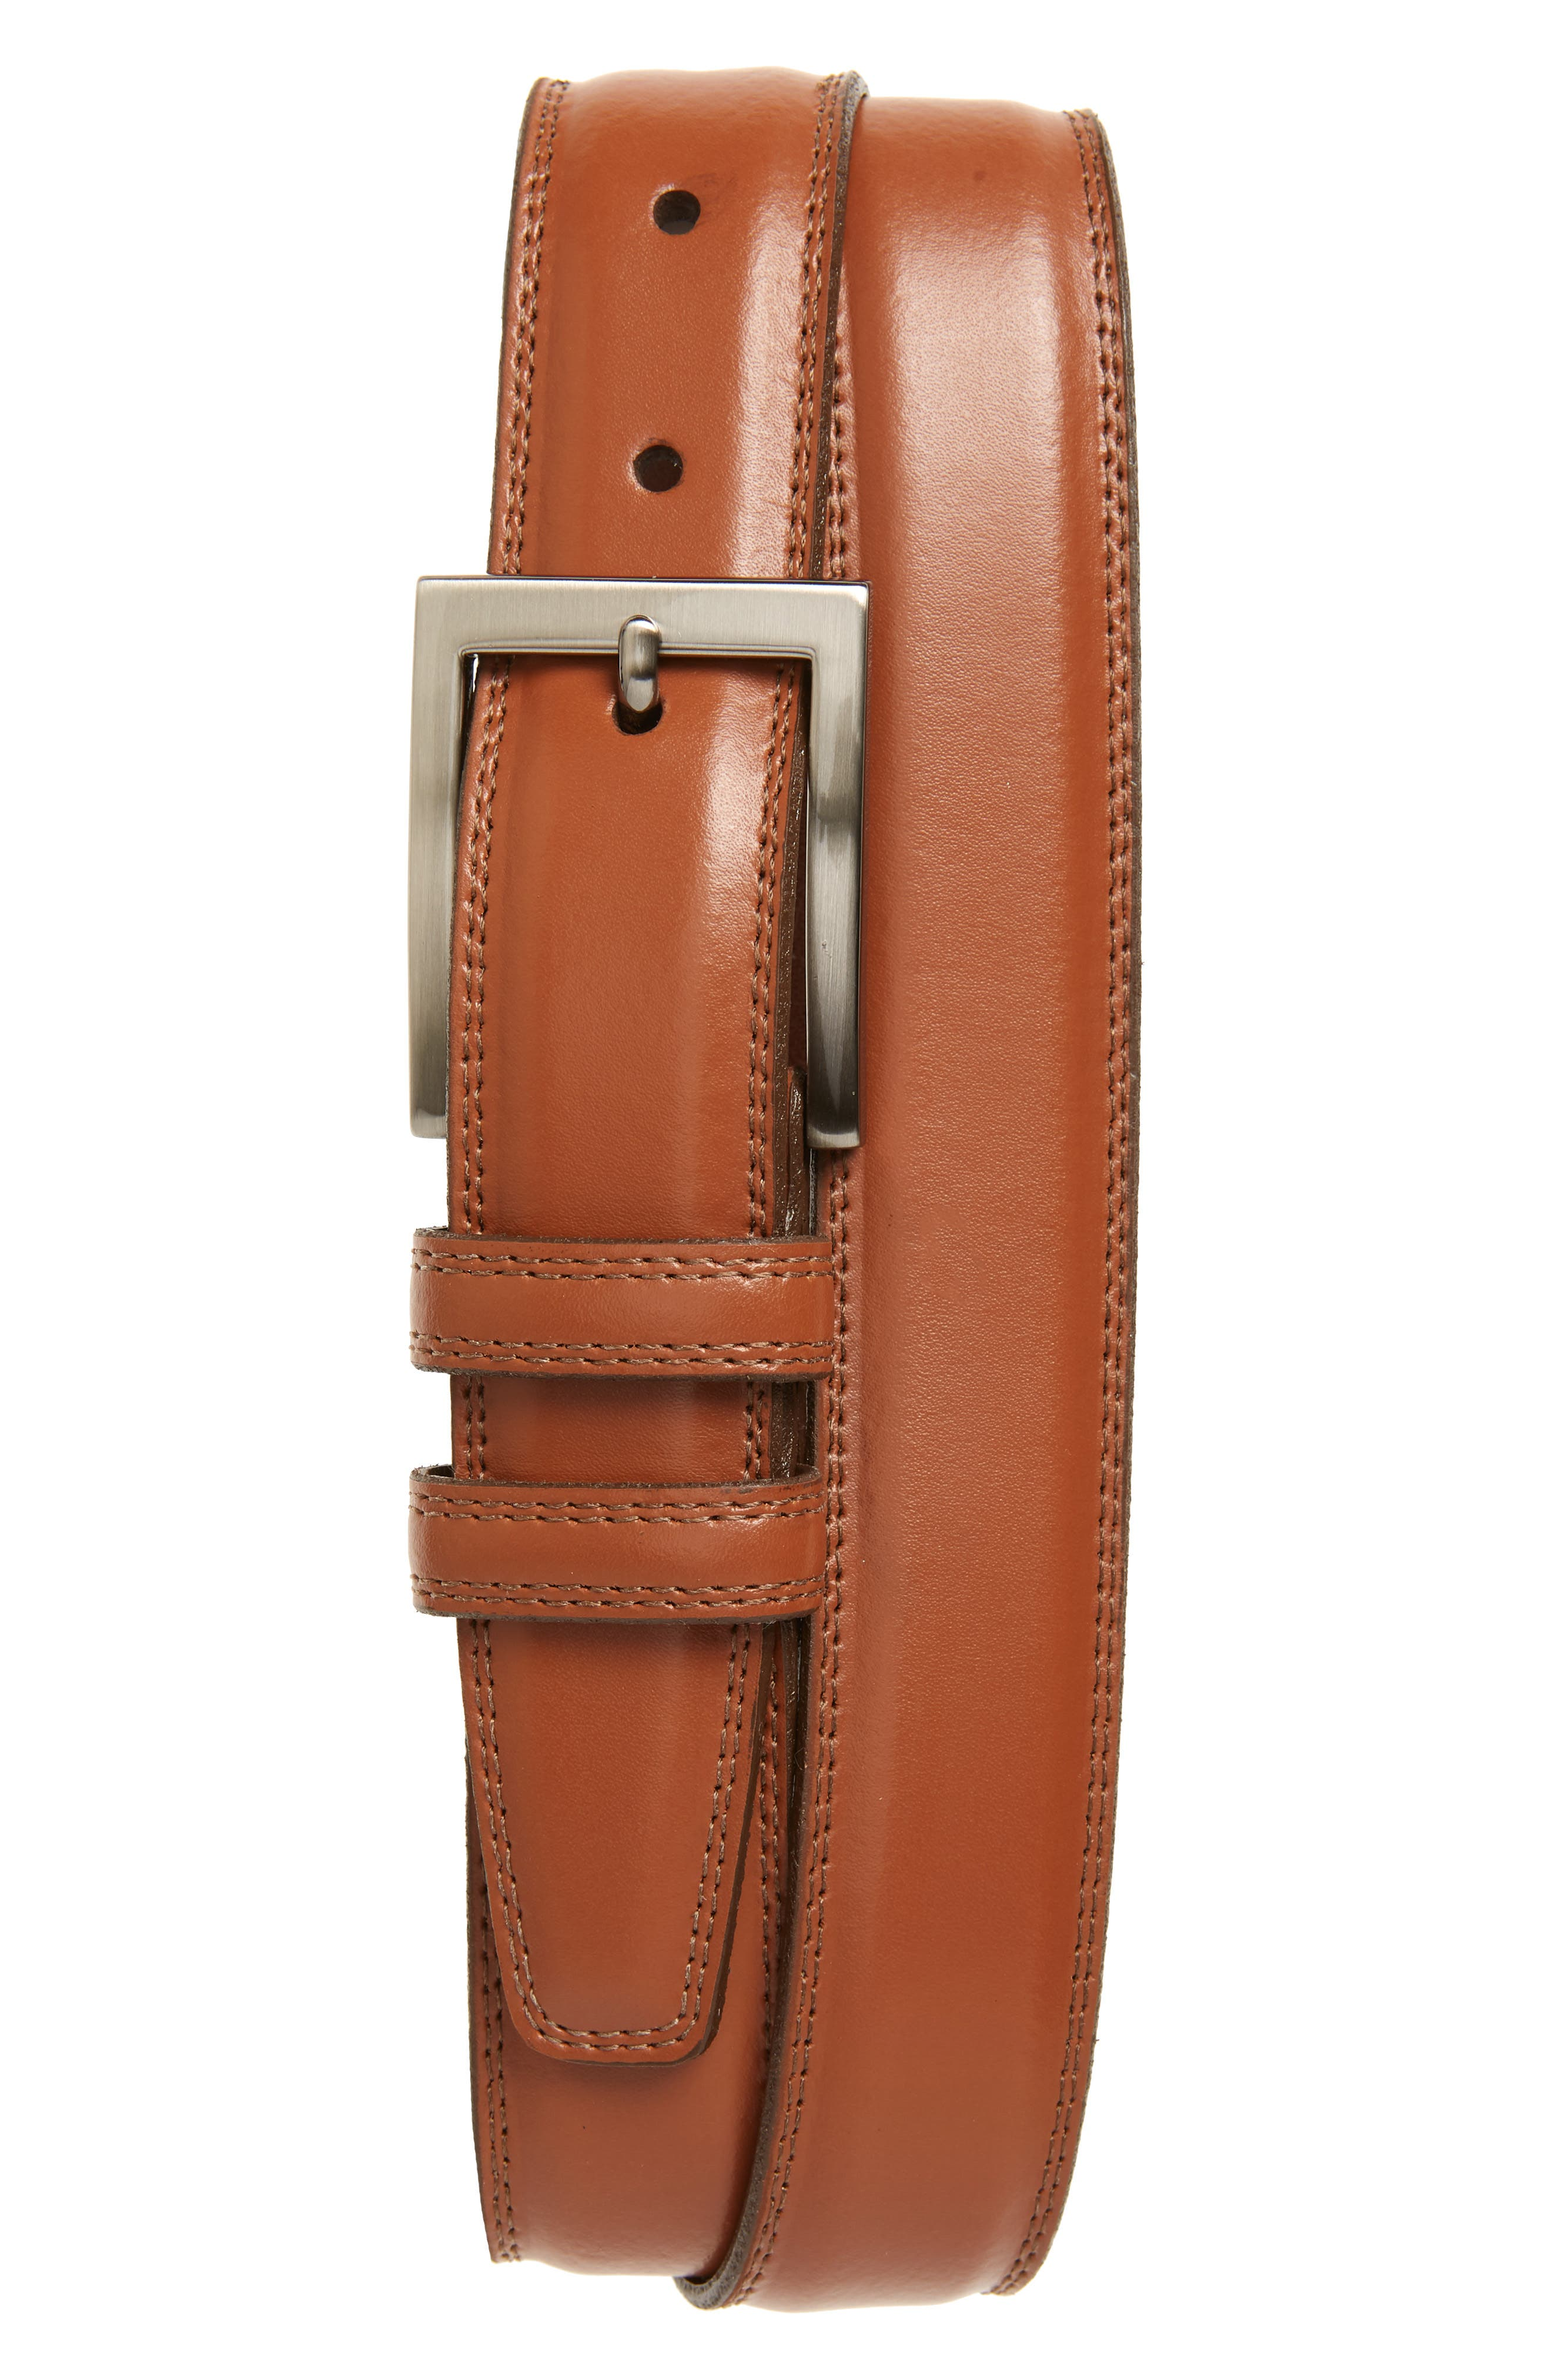 Torino Belts Aniline Leather Belt, Tan